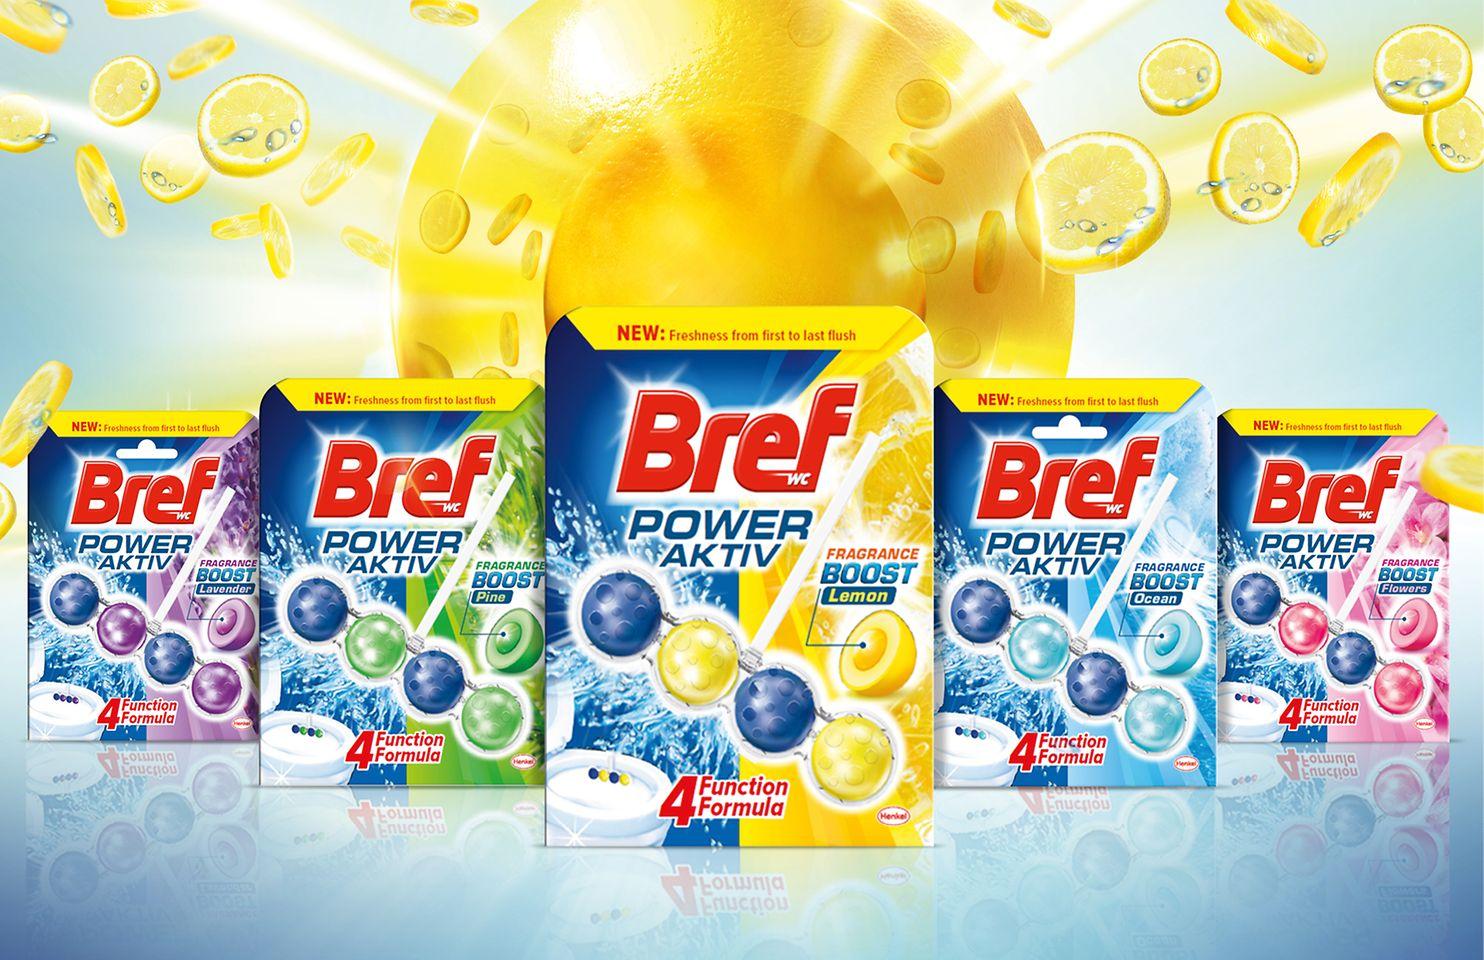 Innovation Laundry & Home Care: Bref Power Aktiv